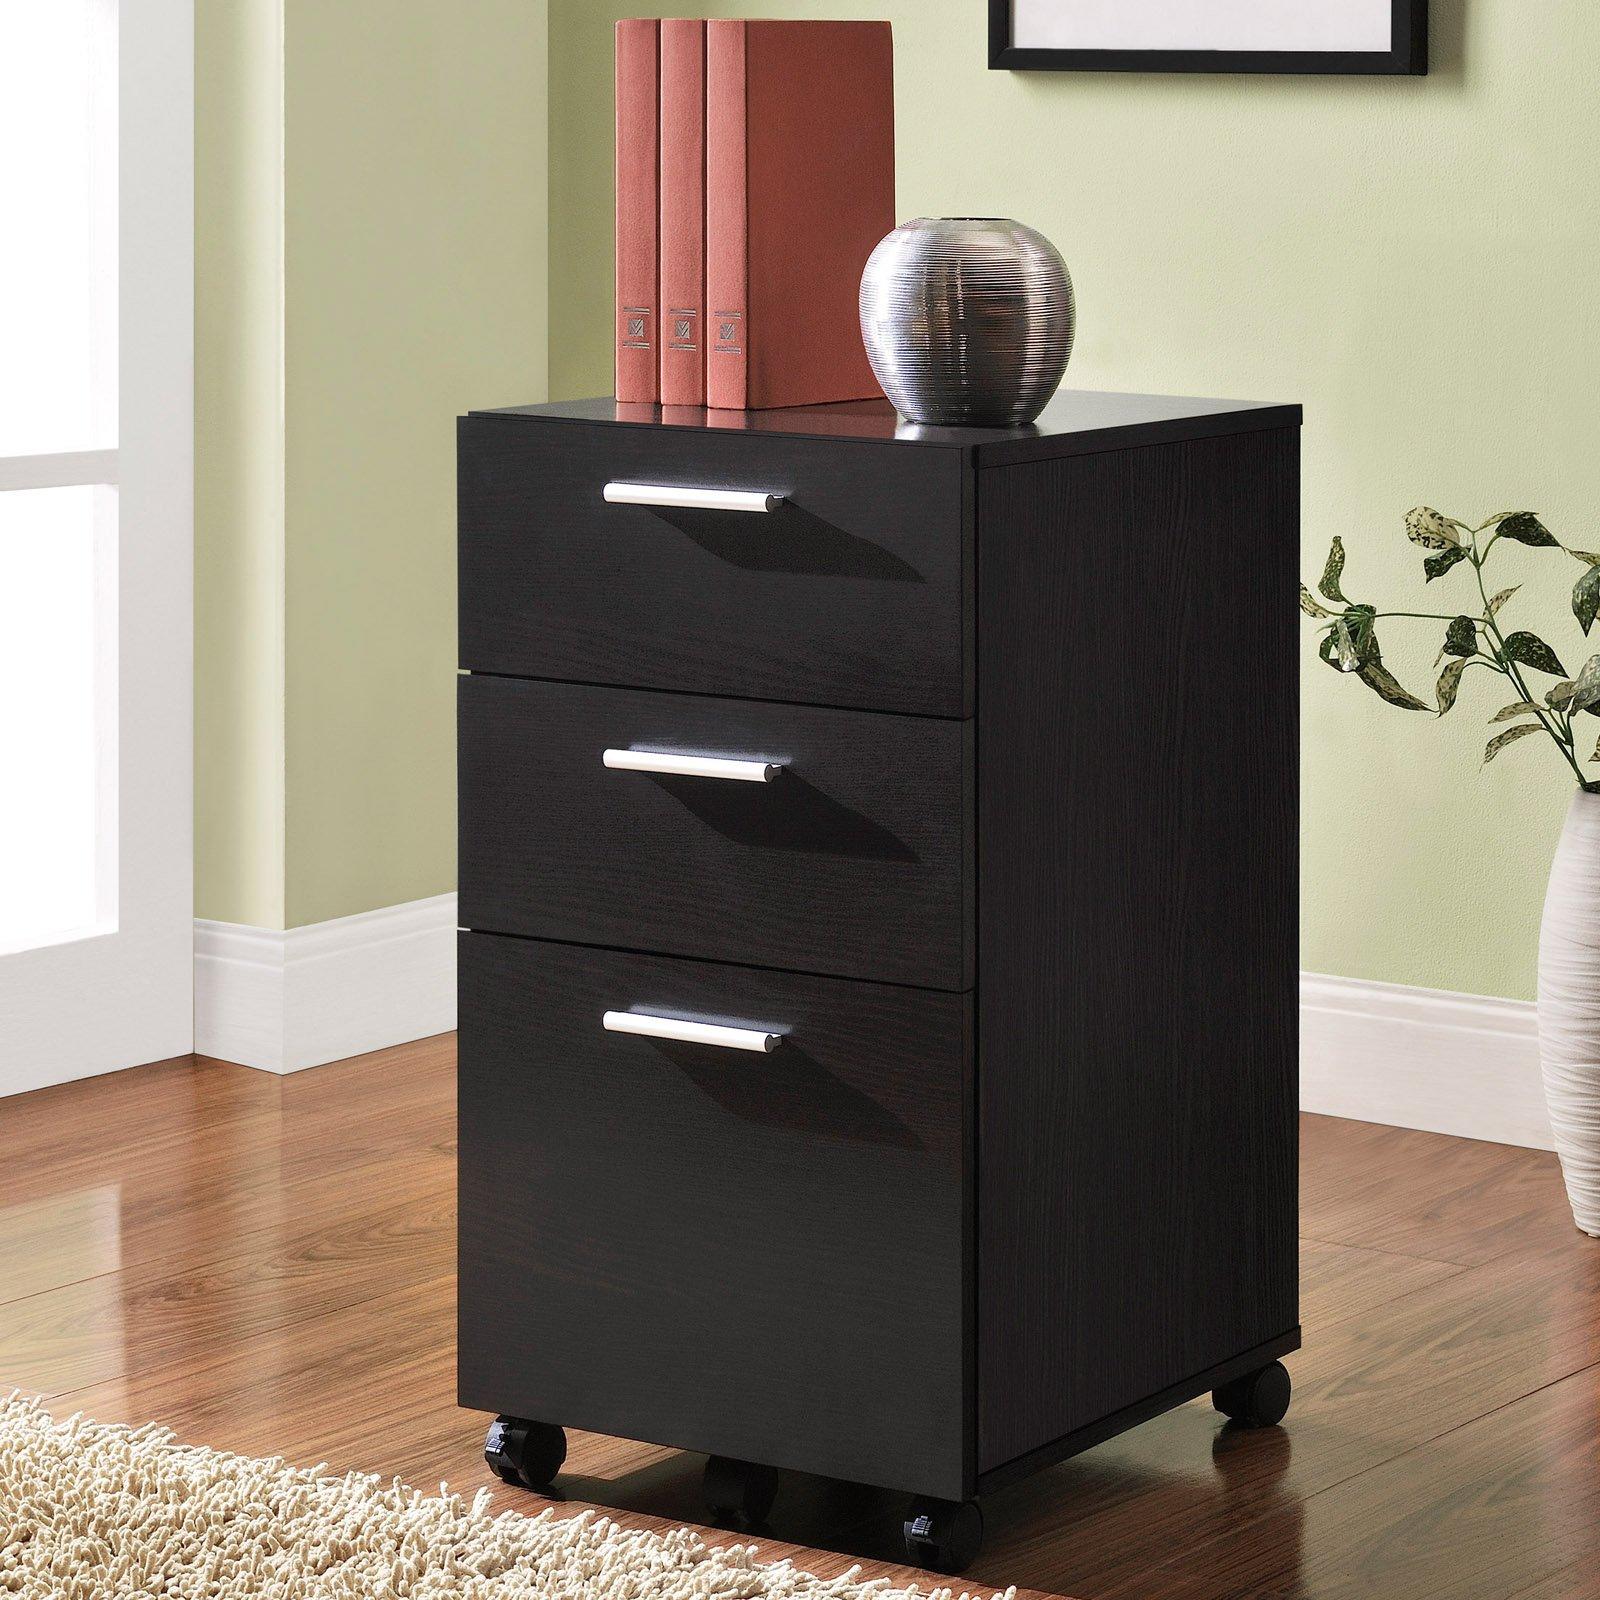 Ameriwood Home Princeton Mobile File Cabinet, Espresso